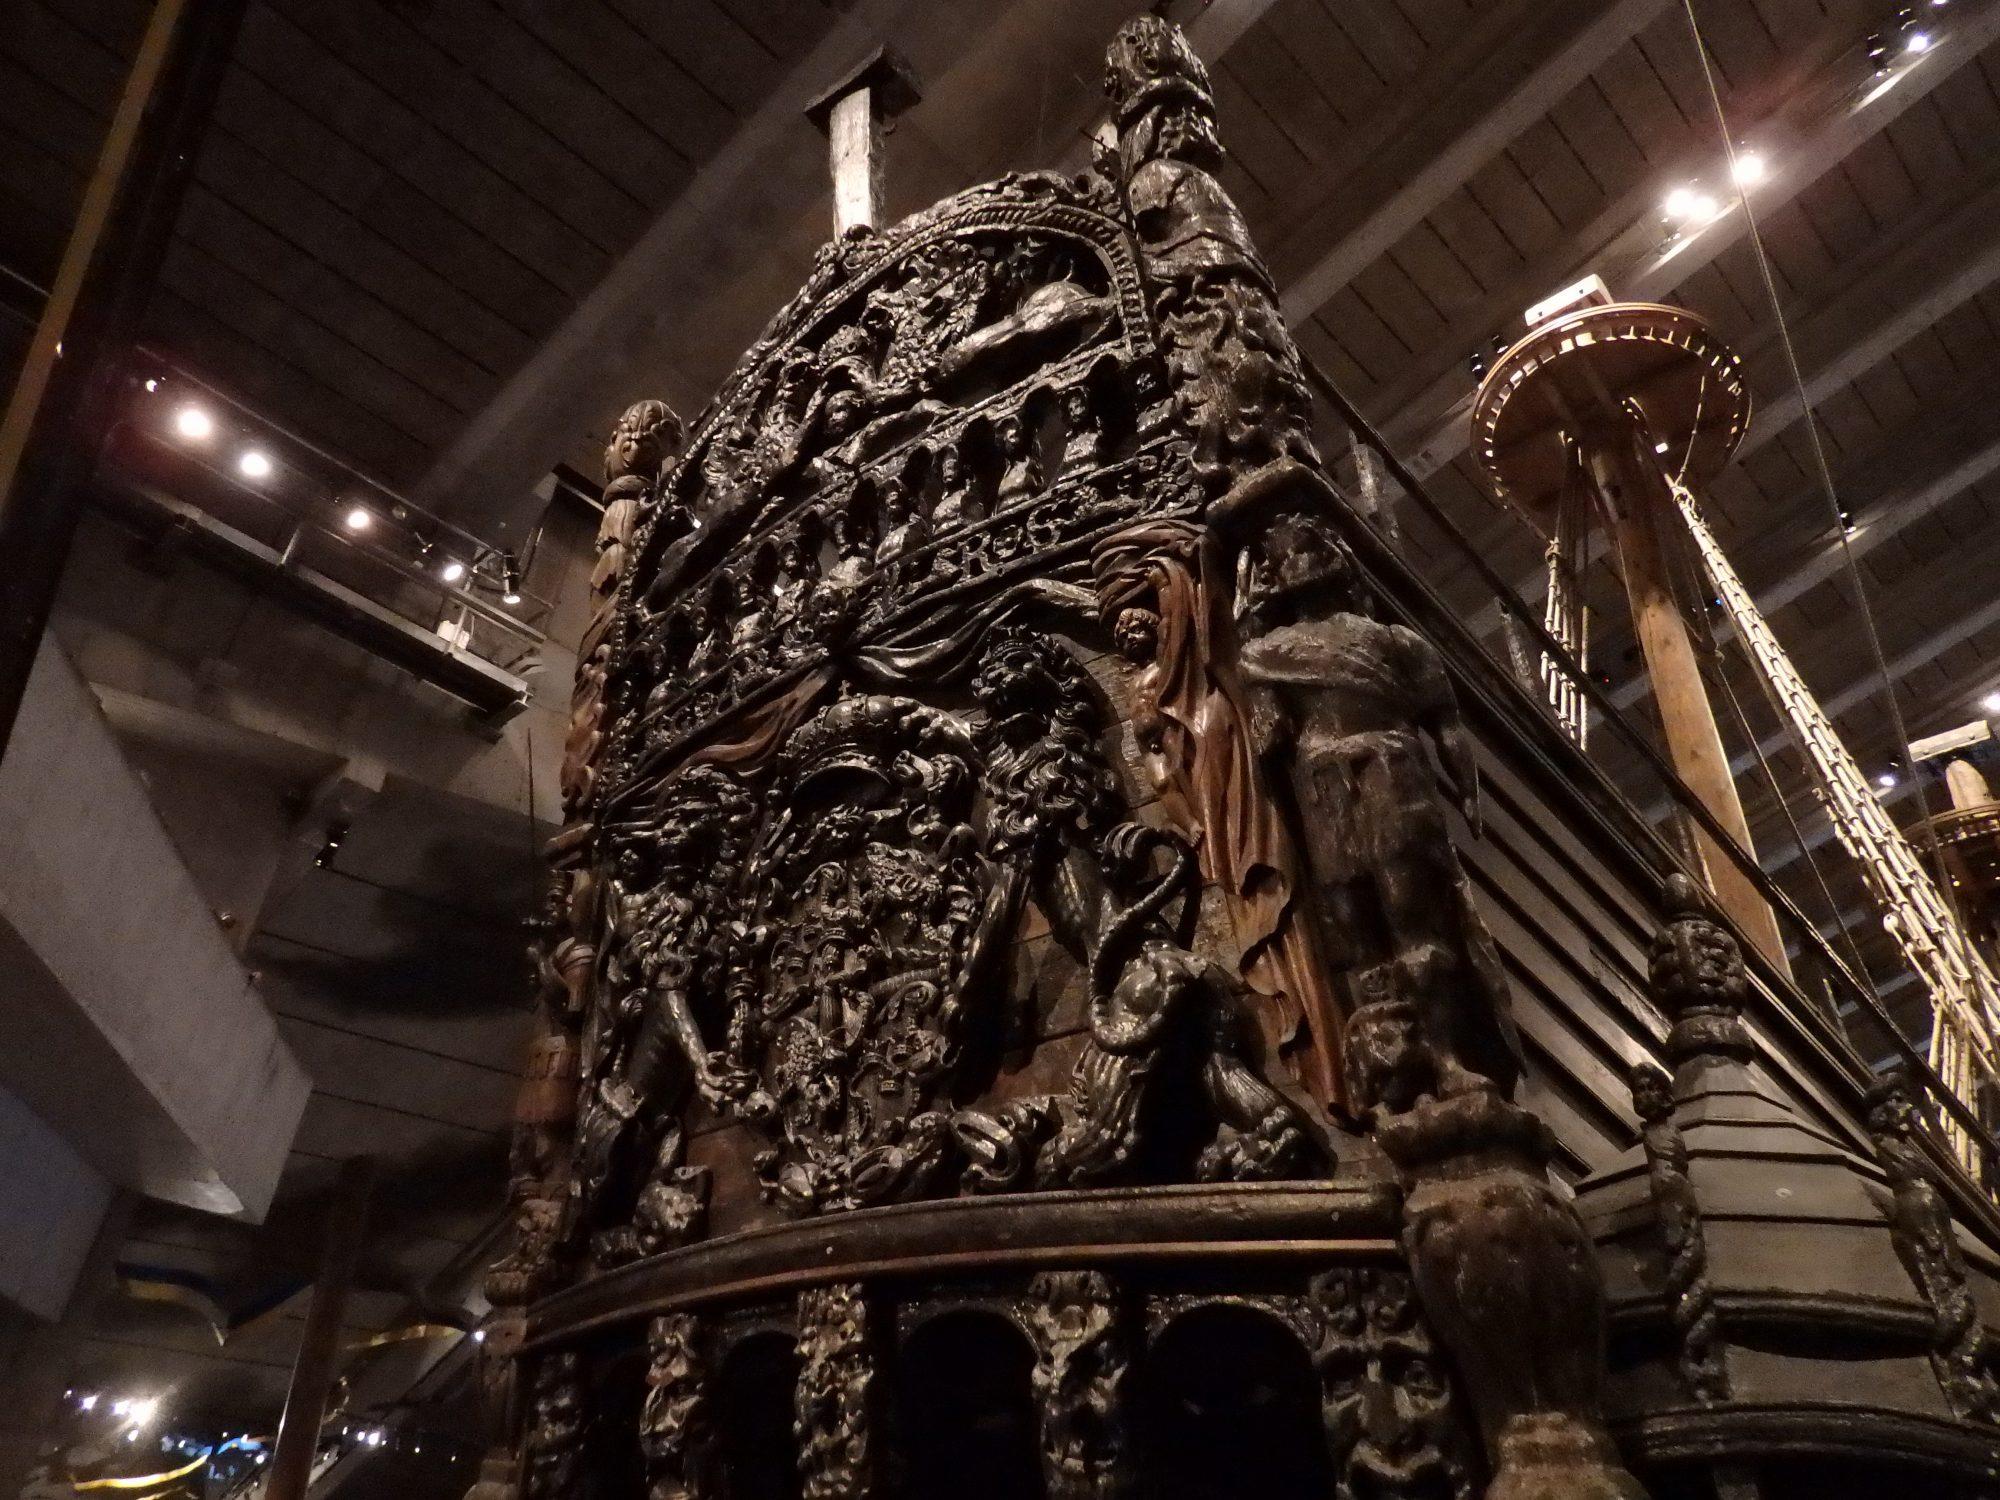 Upper part of the stern of the Vasa: Stockholm, Sweden